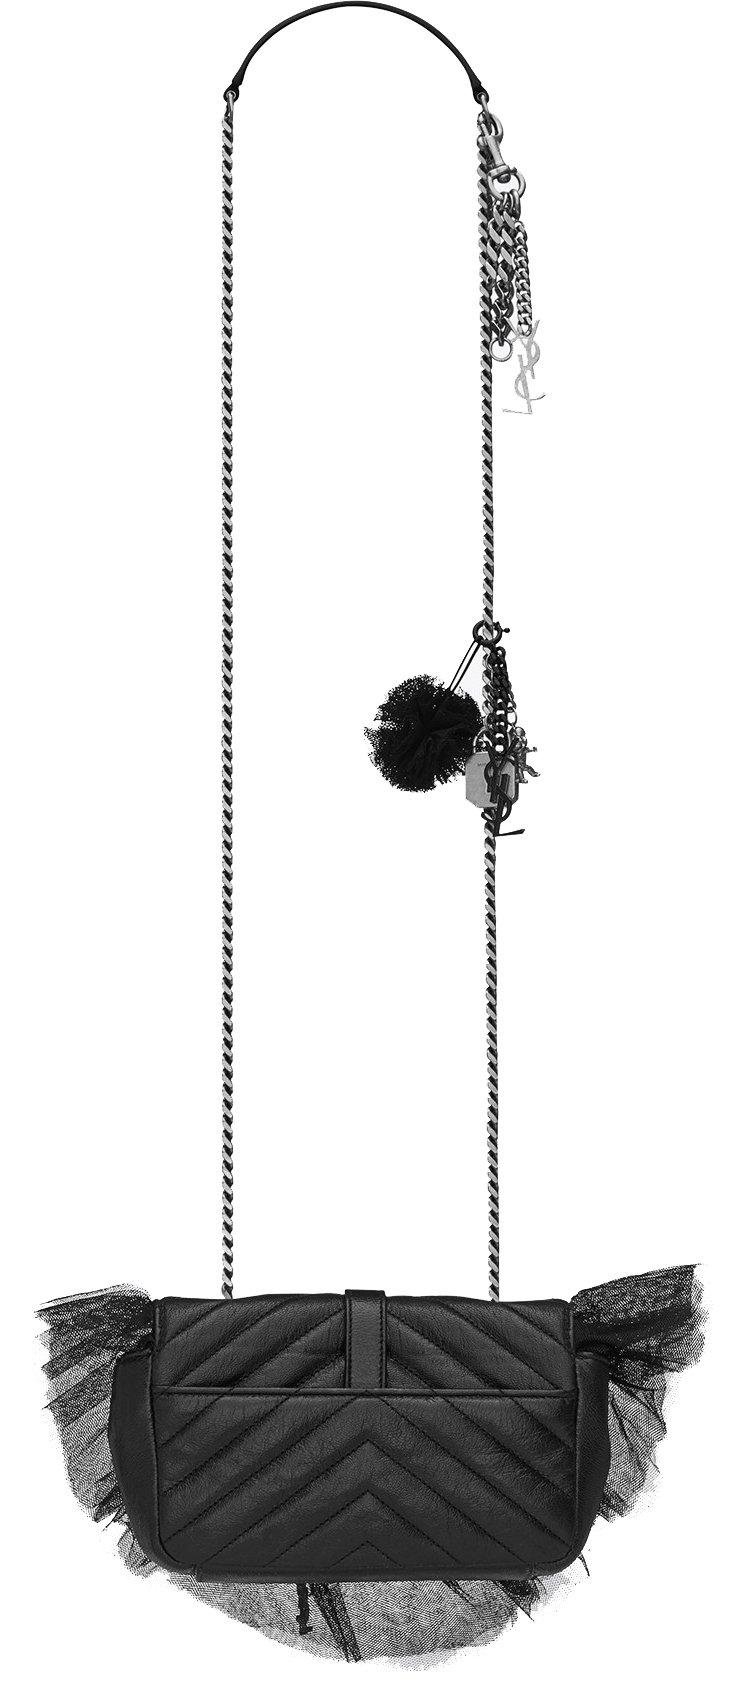 Saint Laurent Classic Baby Monogram Saint Laurent Chain Bag In Black Leather And Crochet